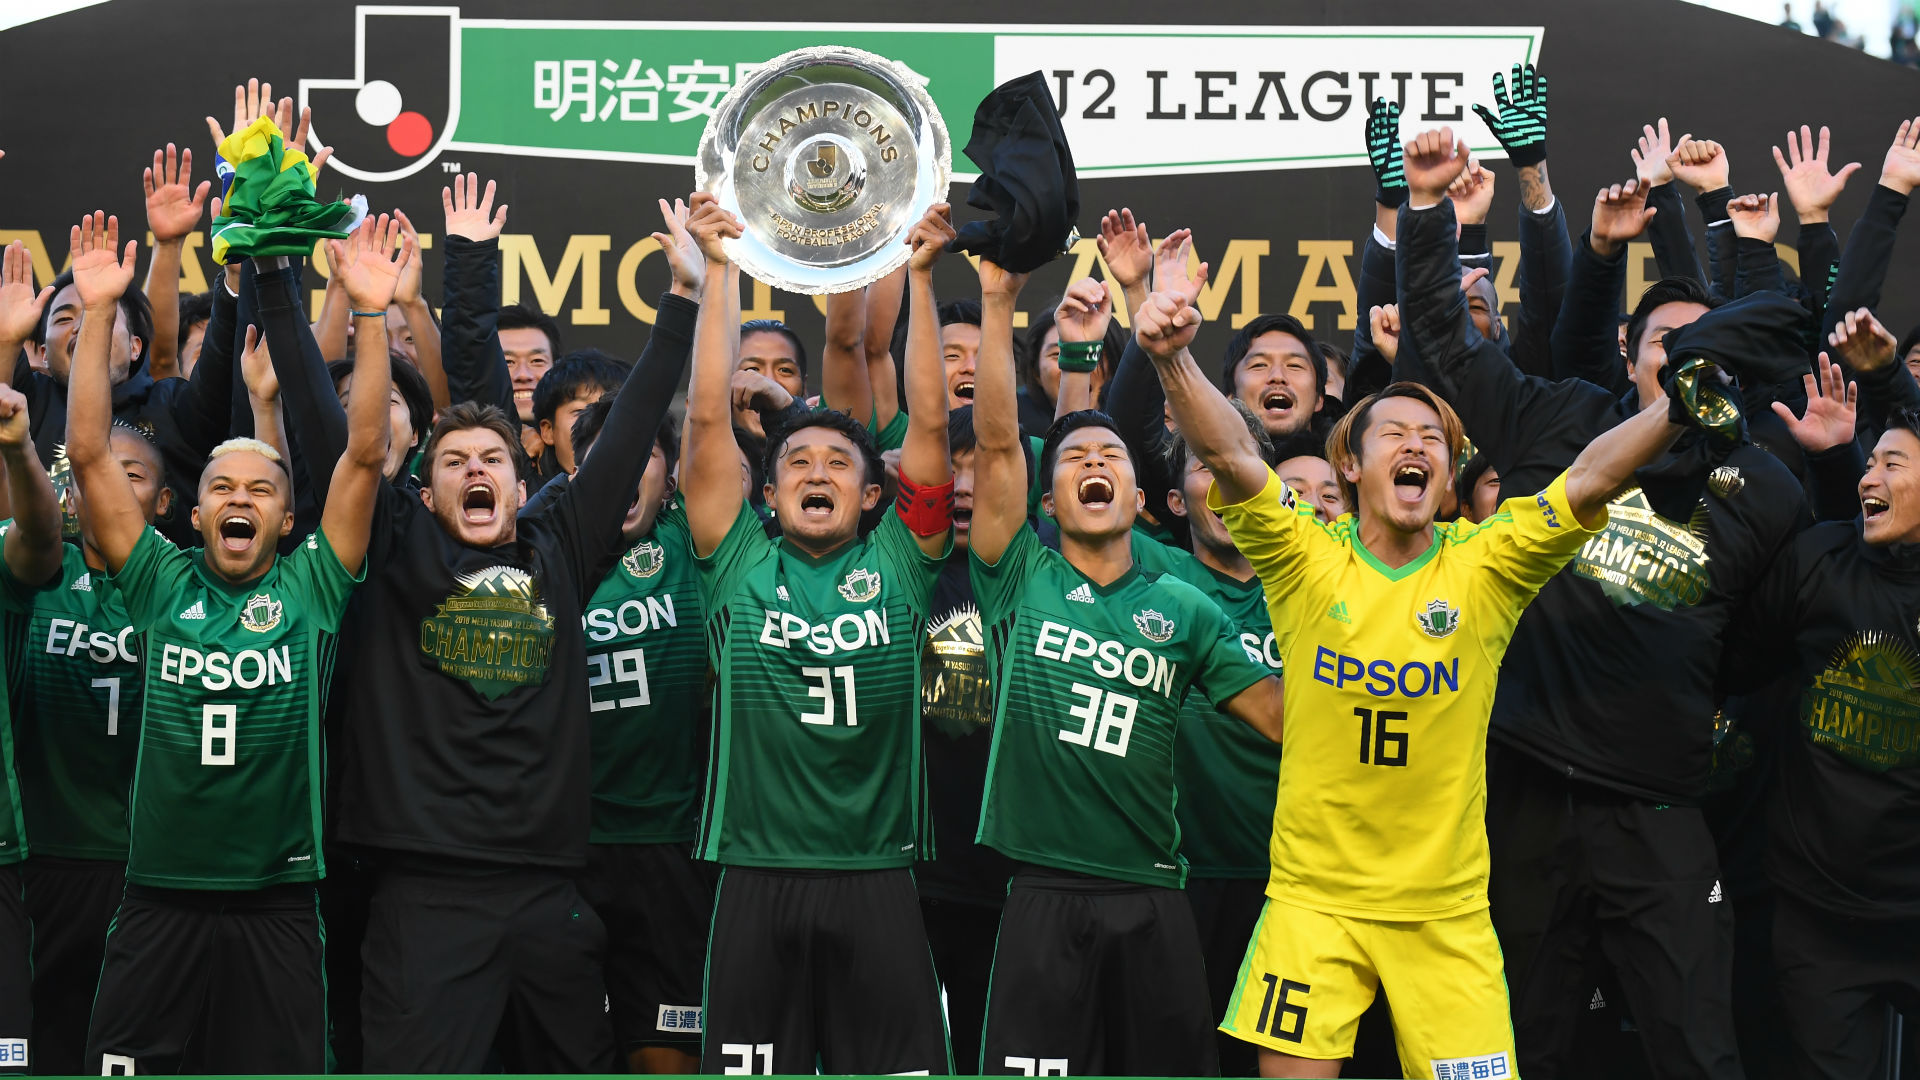 J2 Champions